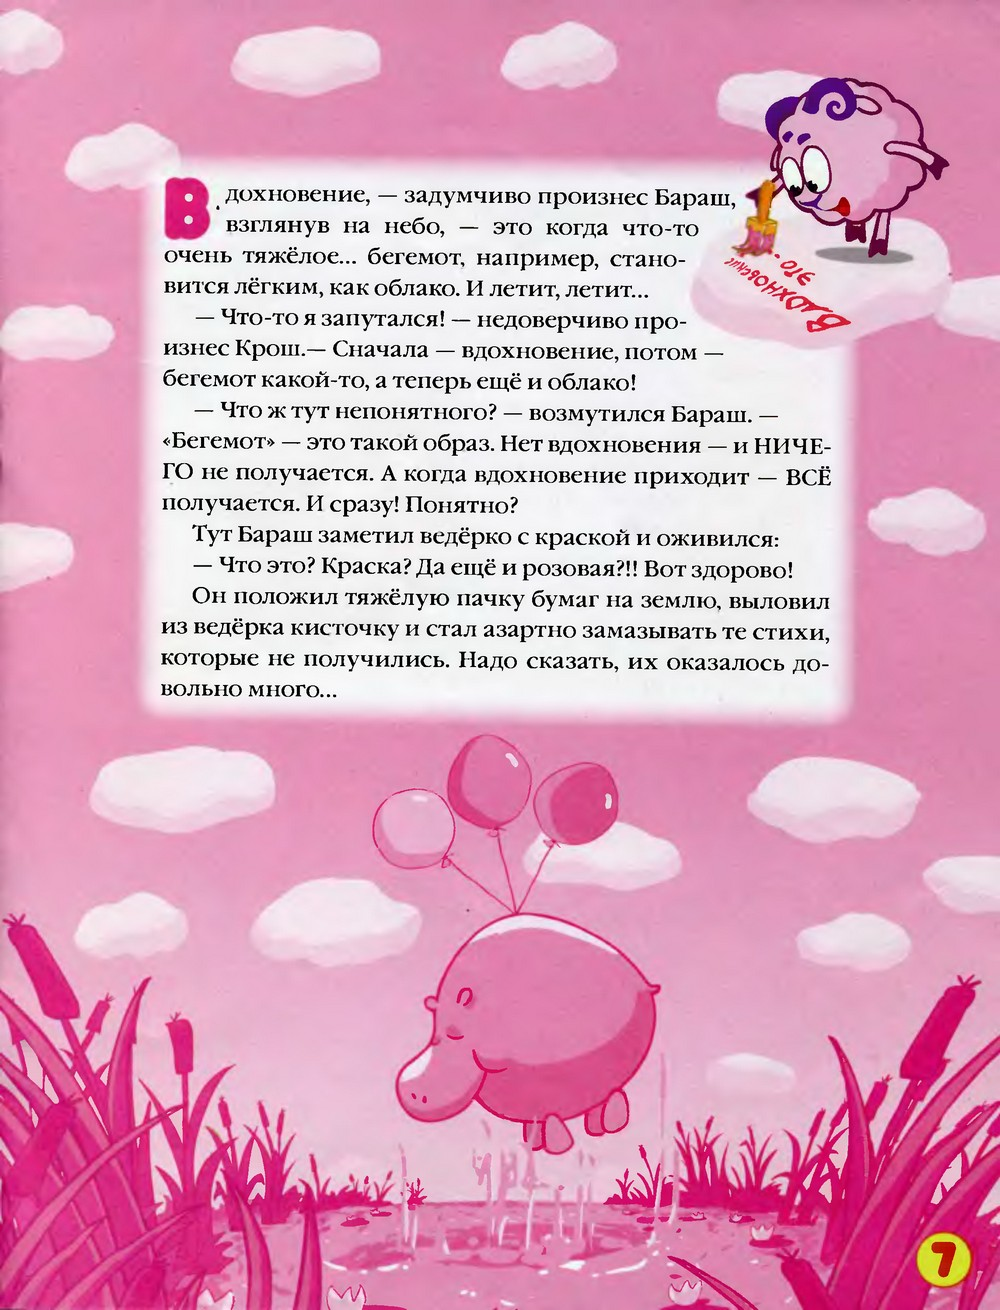 http://i2.imageban.ru/out/2013/11/25/b61046616c5b26601ec8ce9c484cac1a.jpg